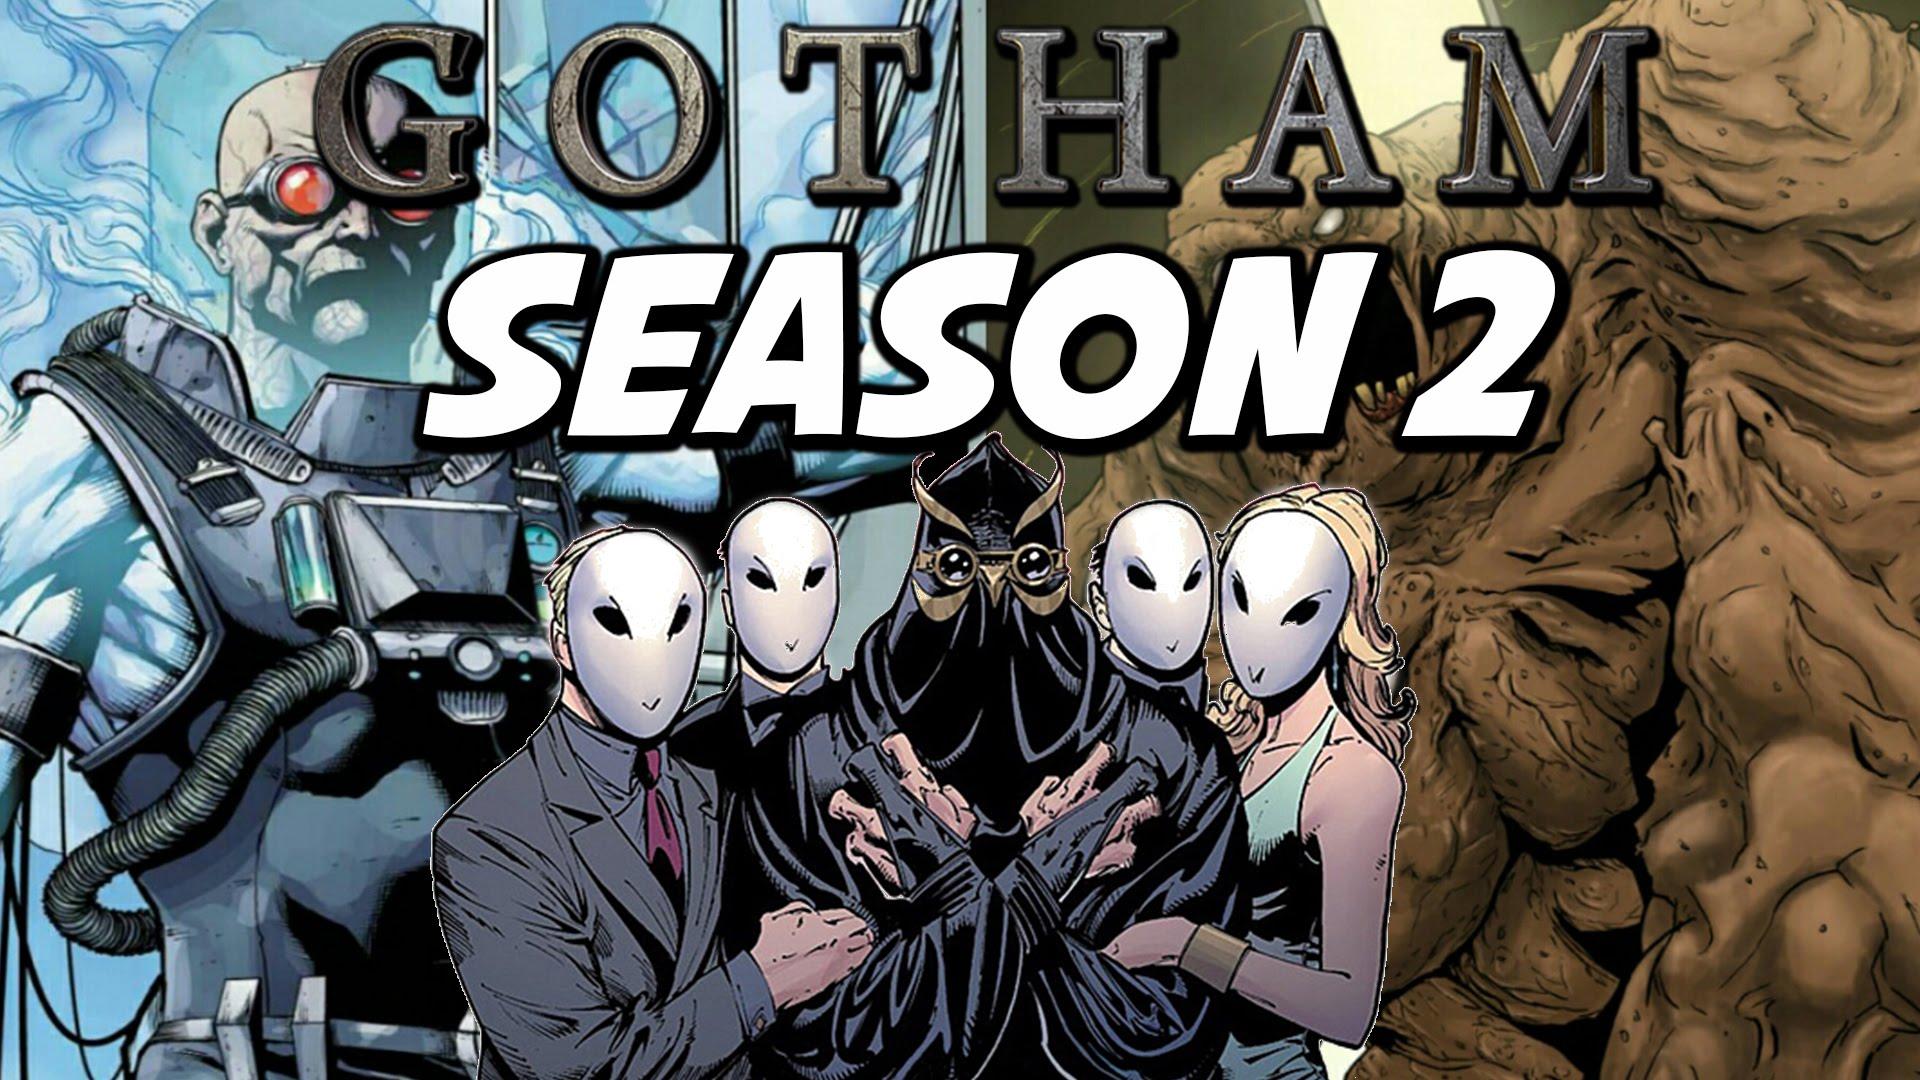 Photo of Gotham Season 2 Plot: The Court of Owls